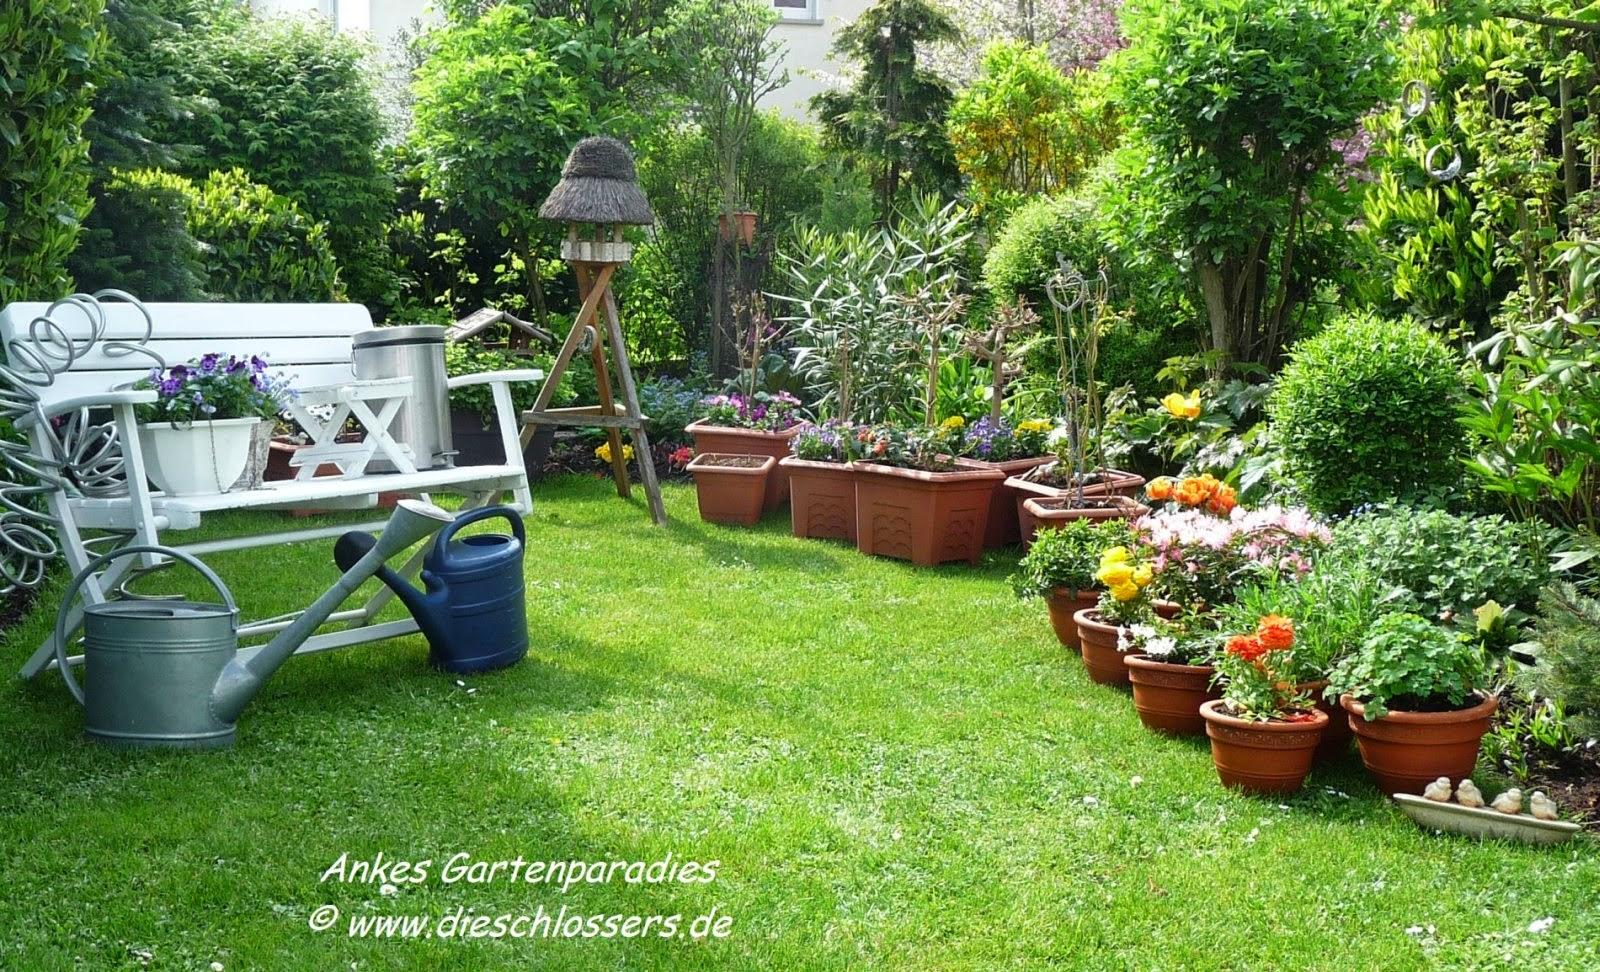 G A R T E N P A R A D I E S ***: Terrasse Und Kübelpflanzen